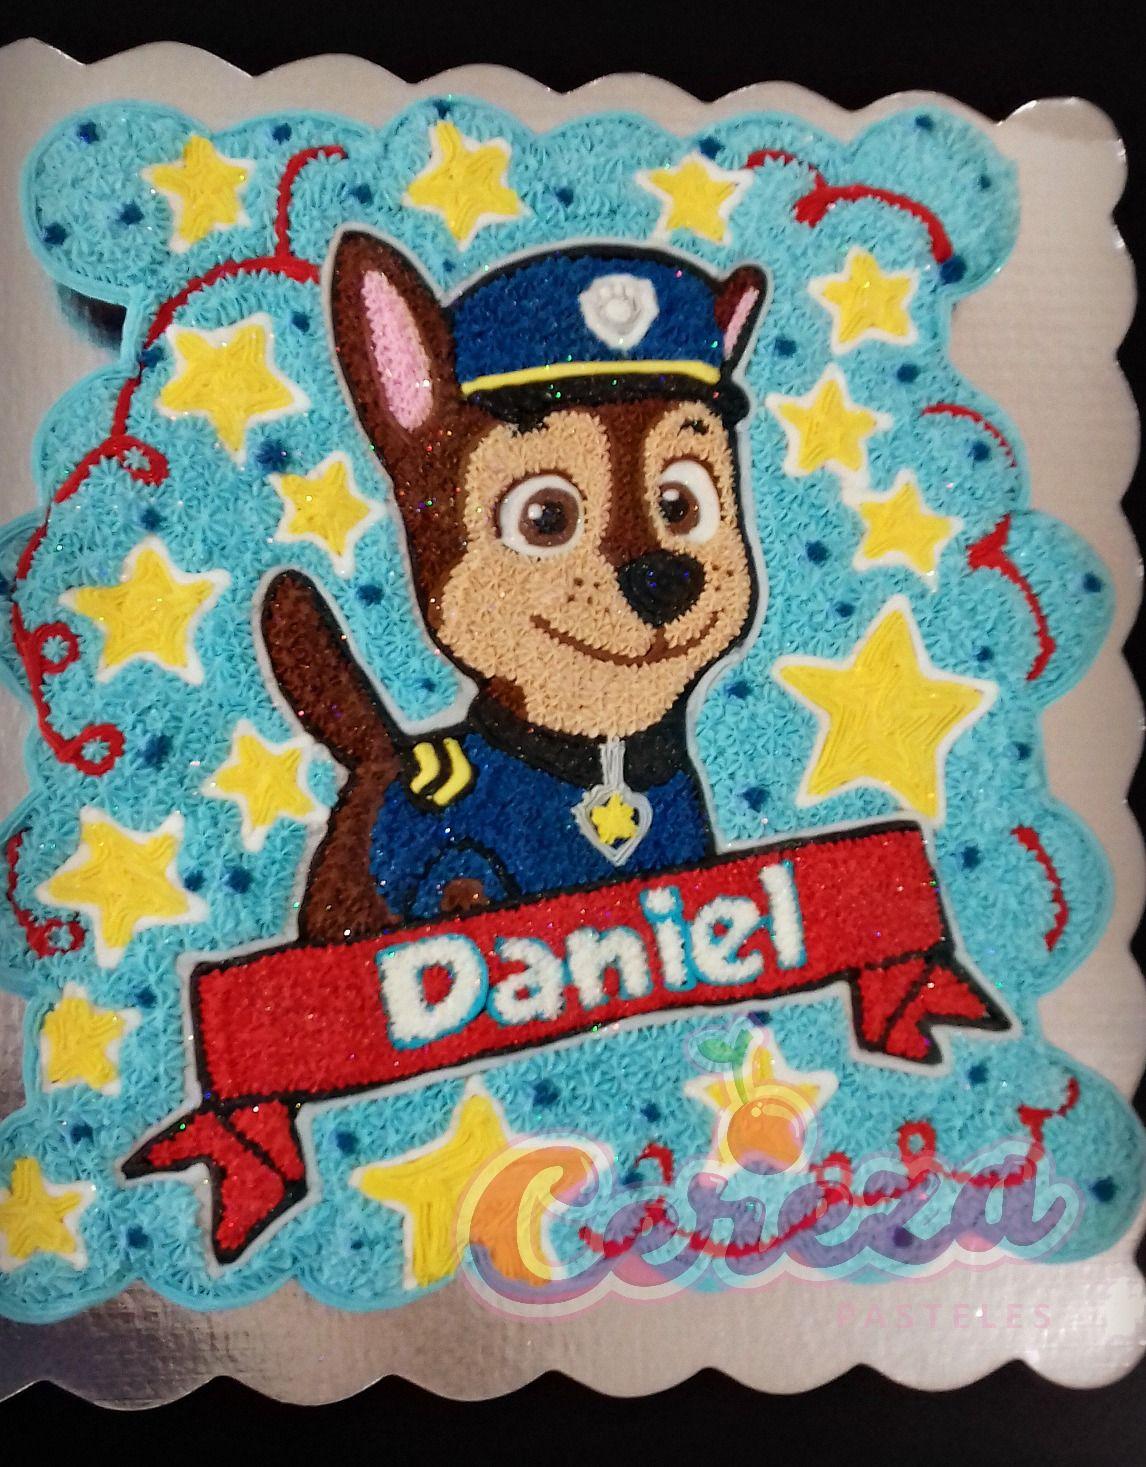 Chase Paw Patrol Cupcake Cake Paw Patrol Cupcakes Cupcake Cakes